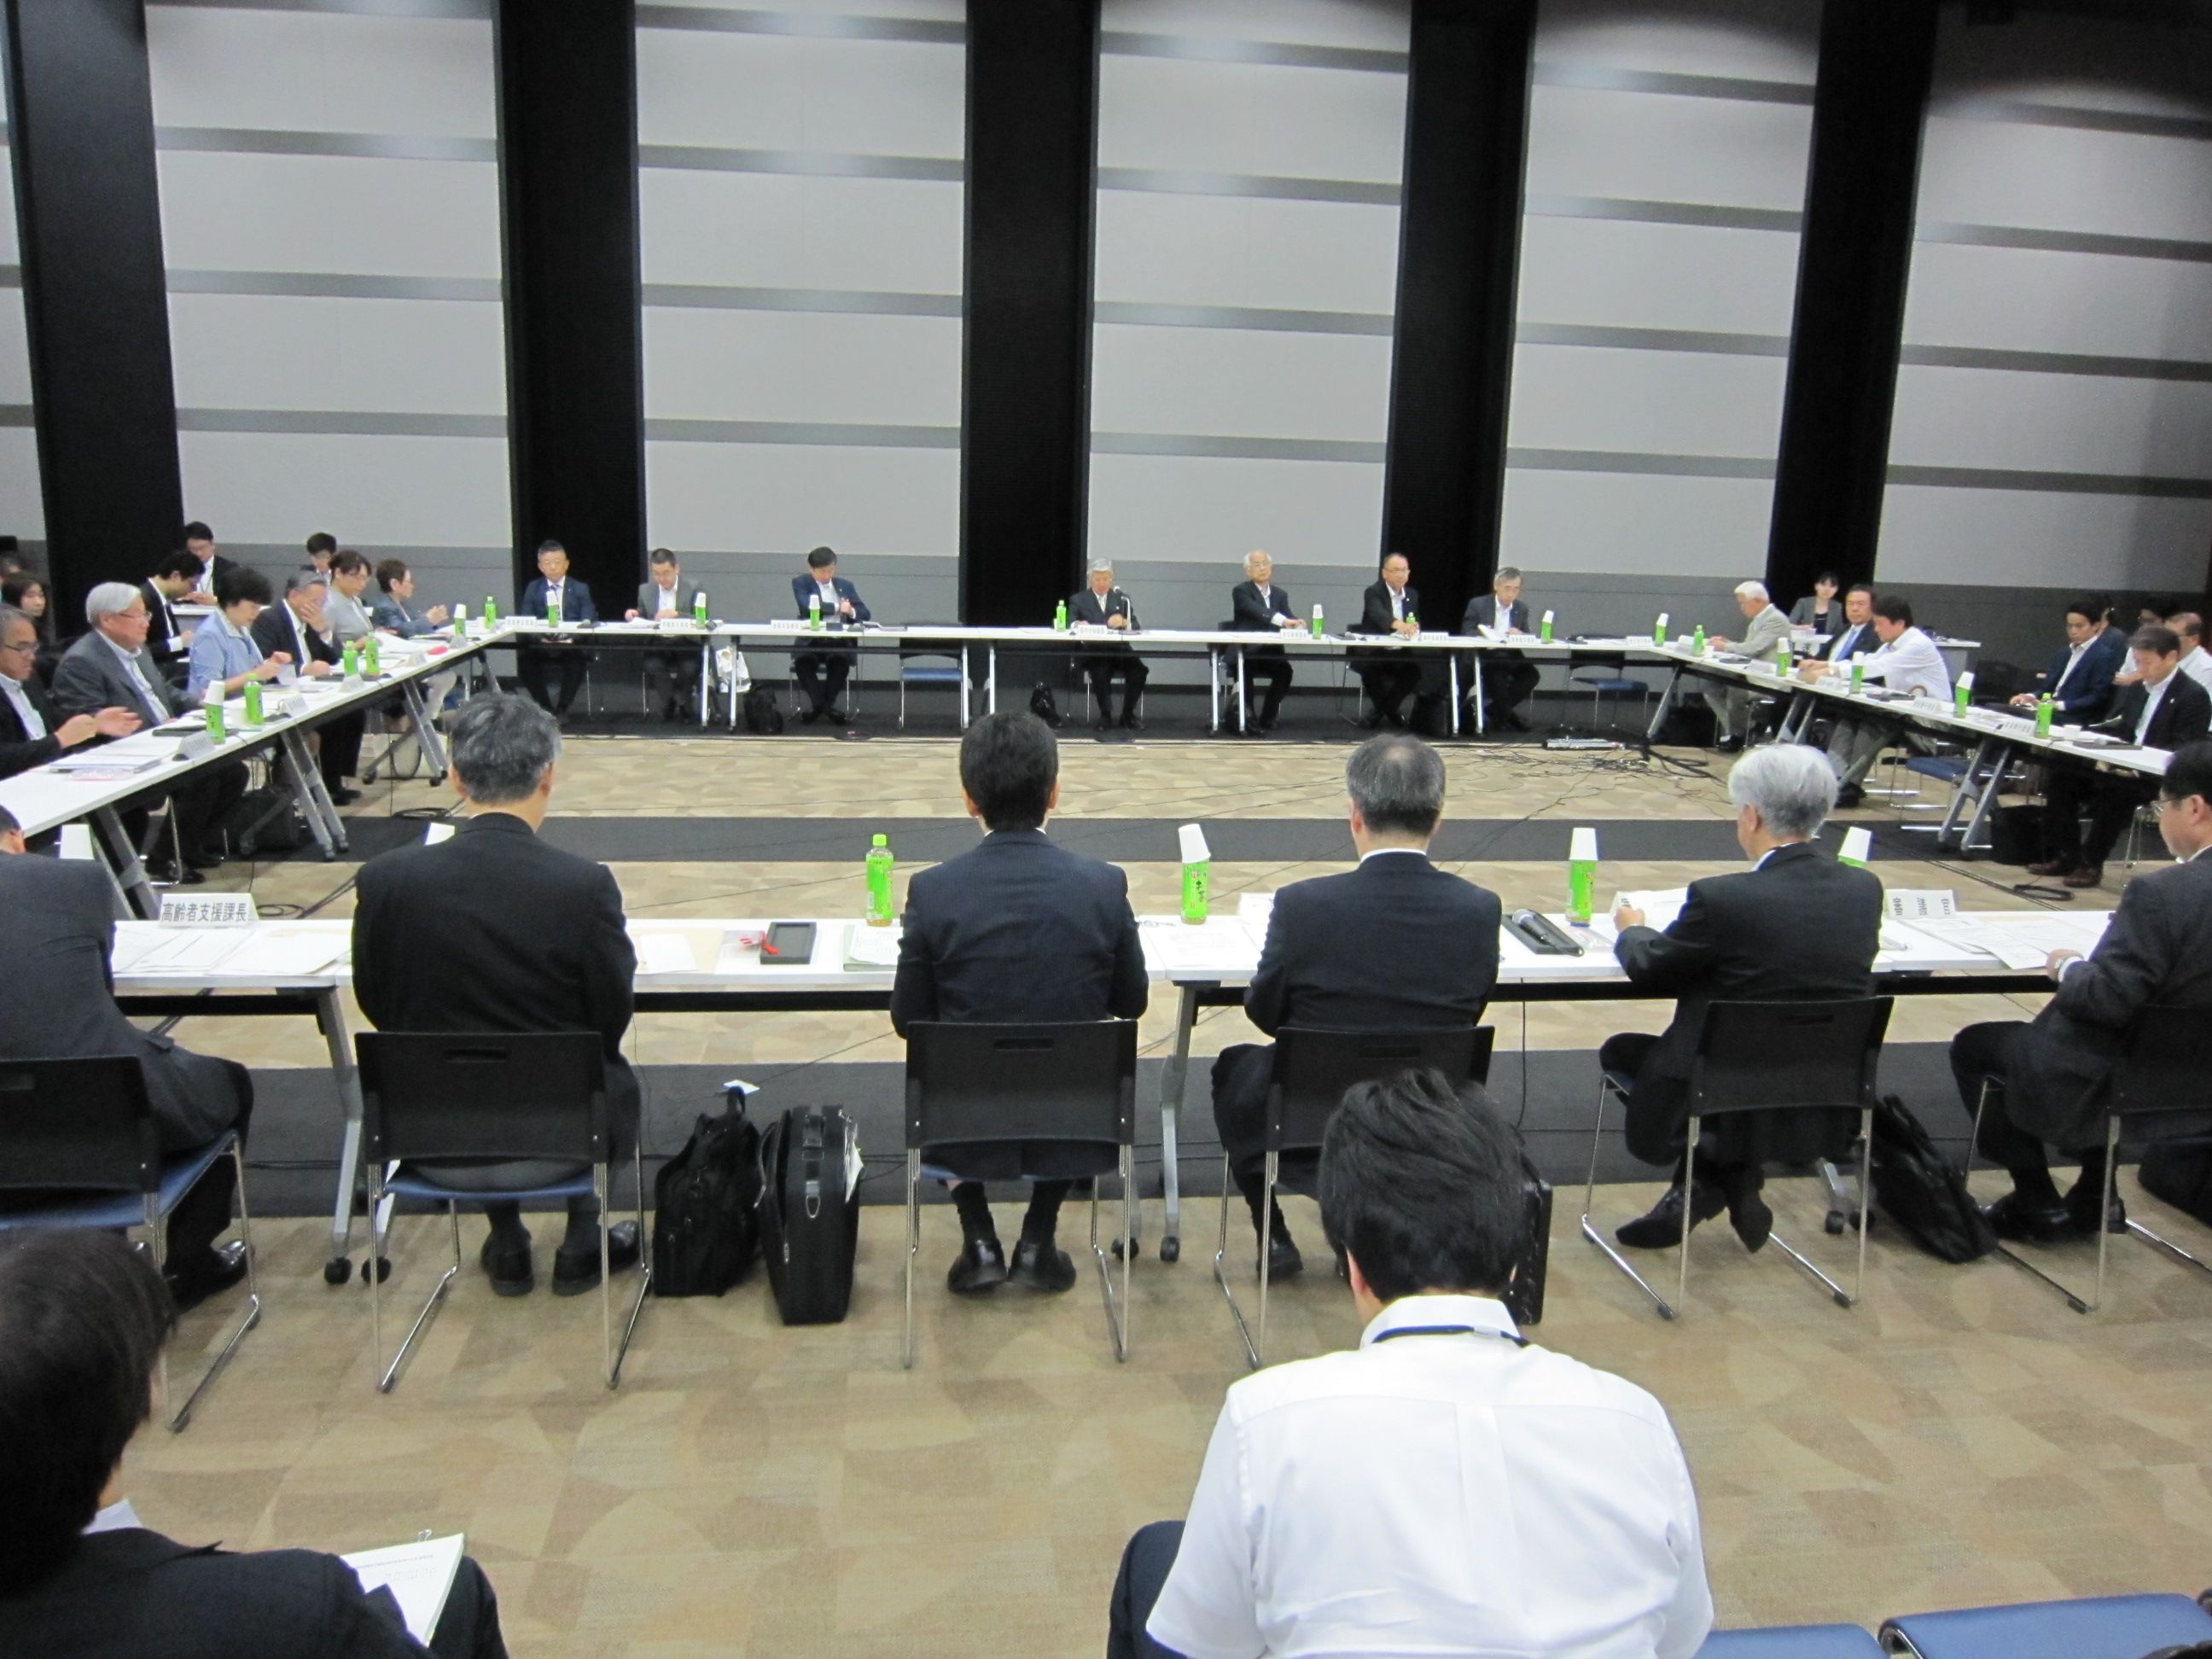 6月15日に開催された、「第130回 社会保障審議会 介護給付費分科会」